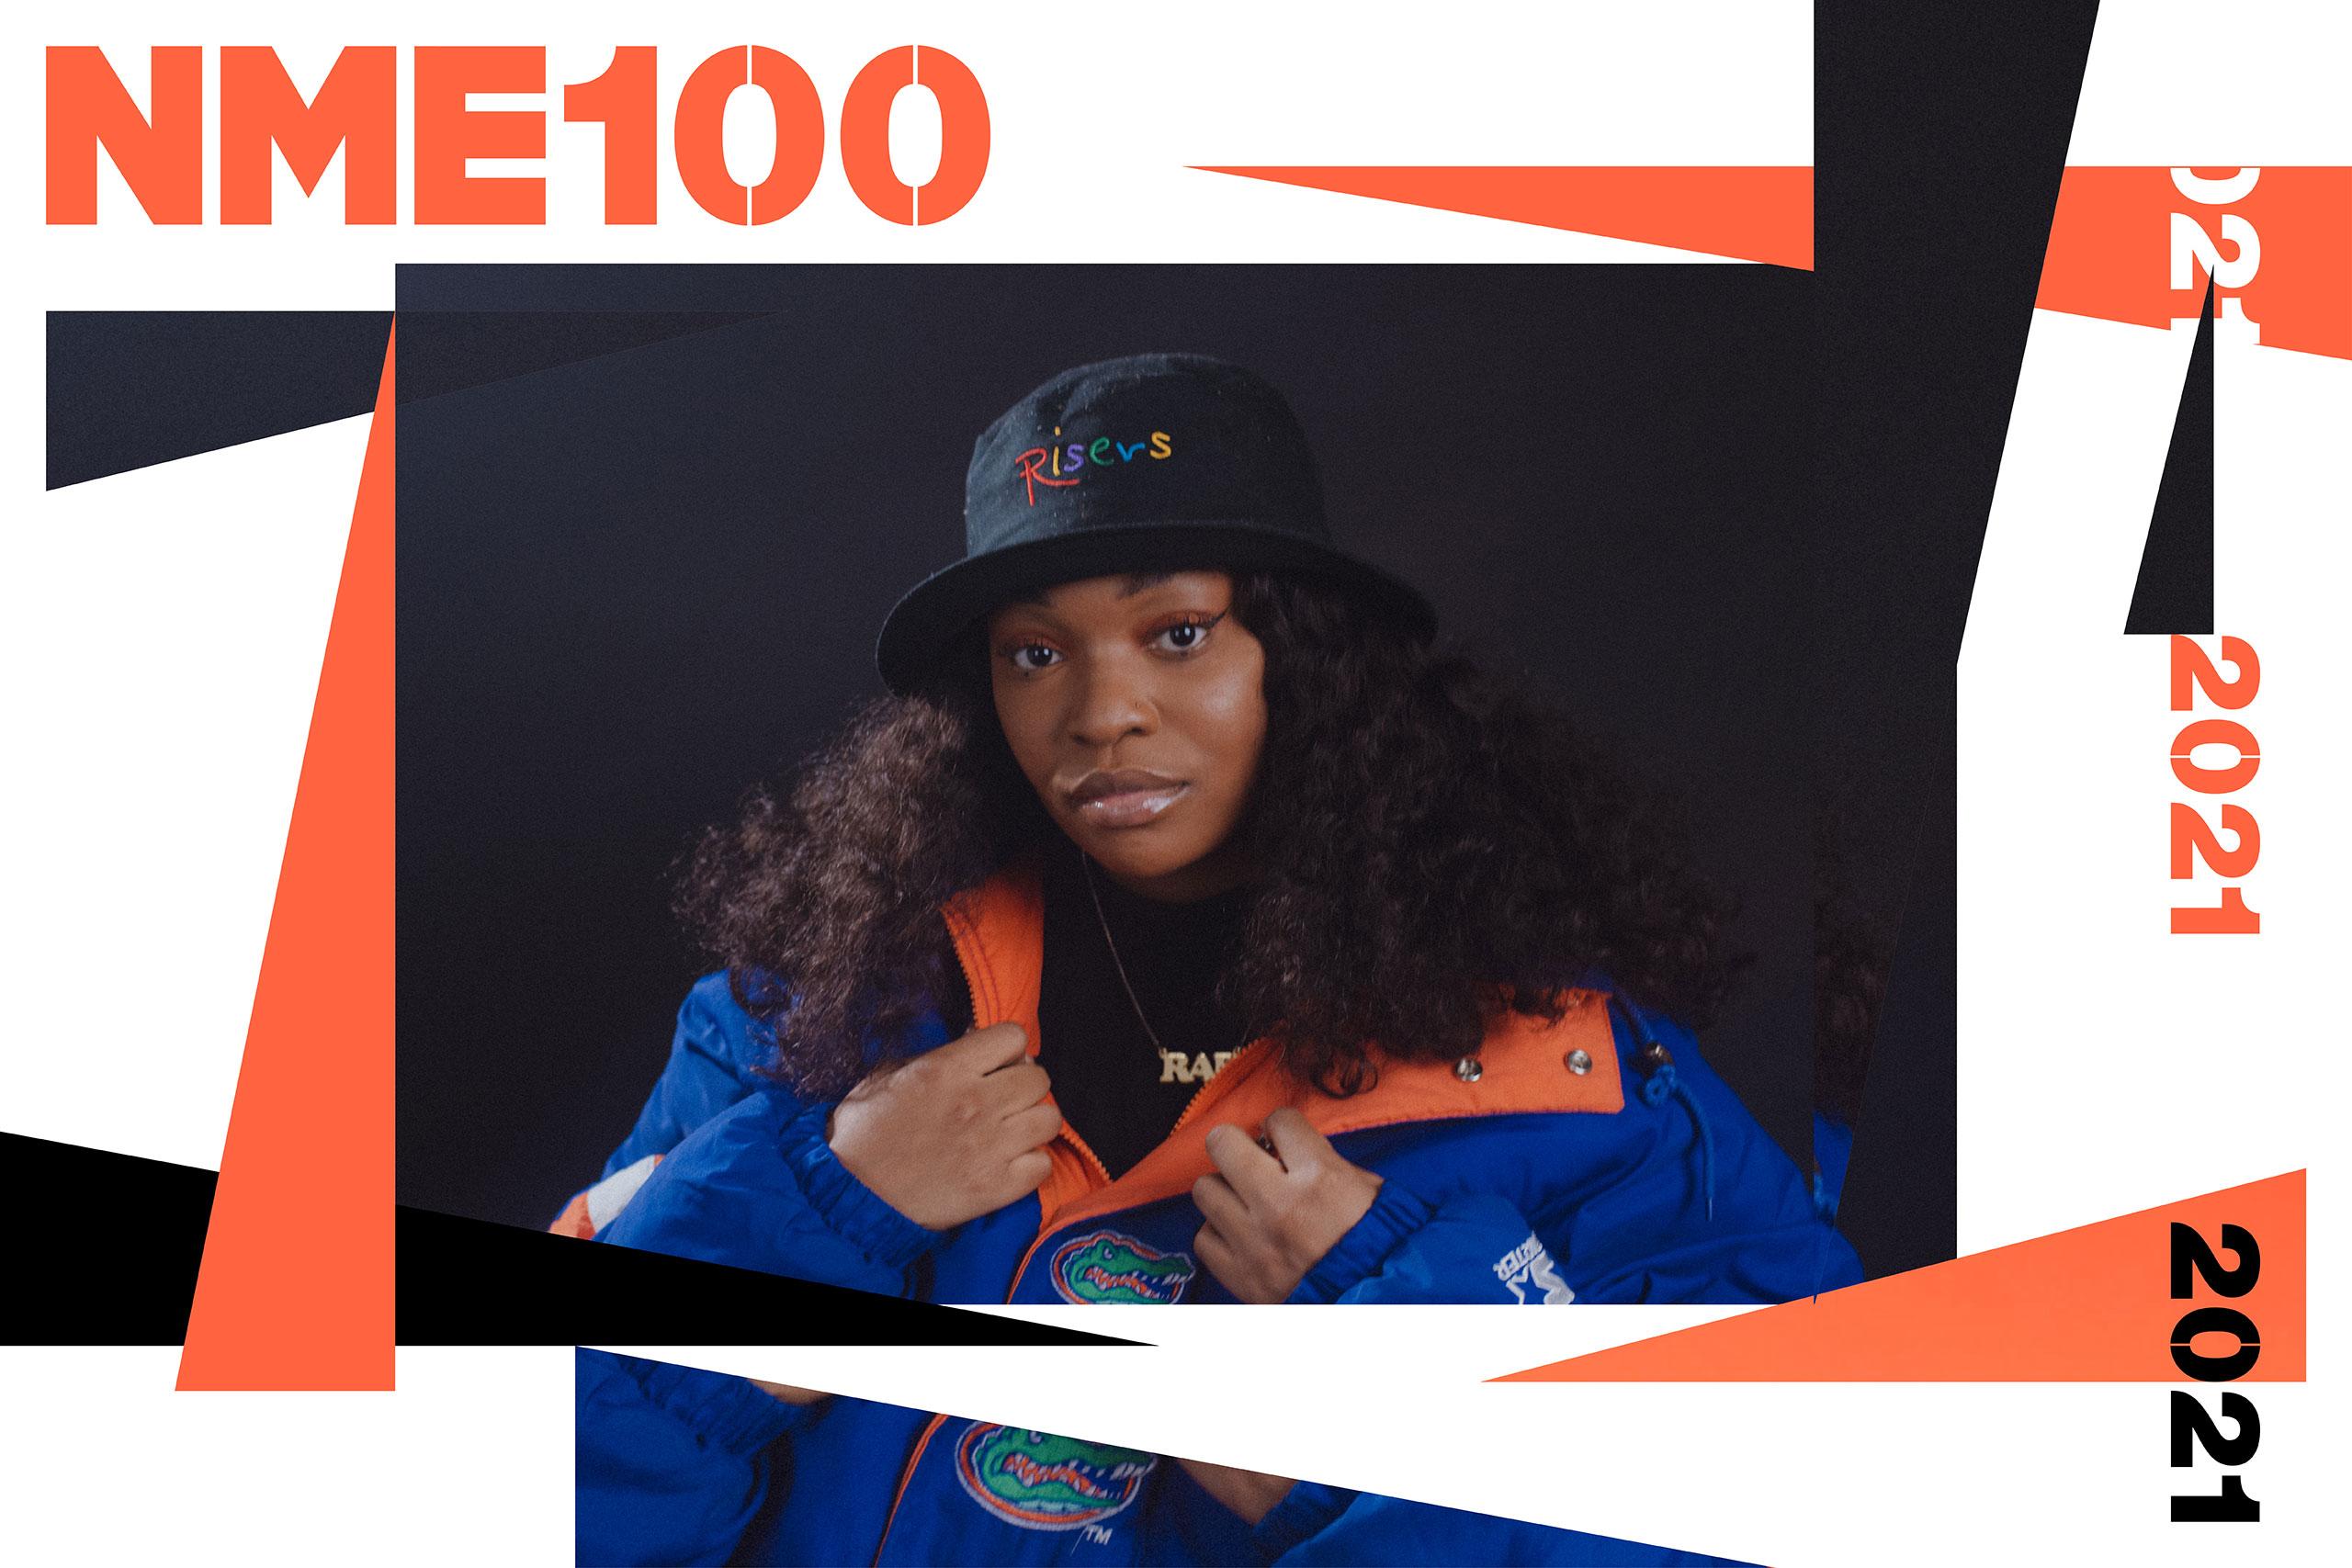 NME 100 rae